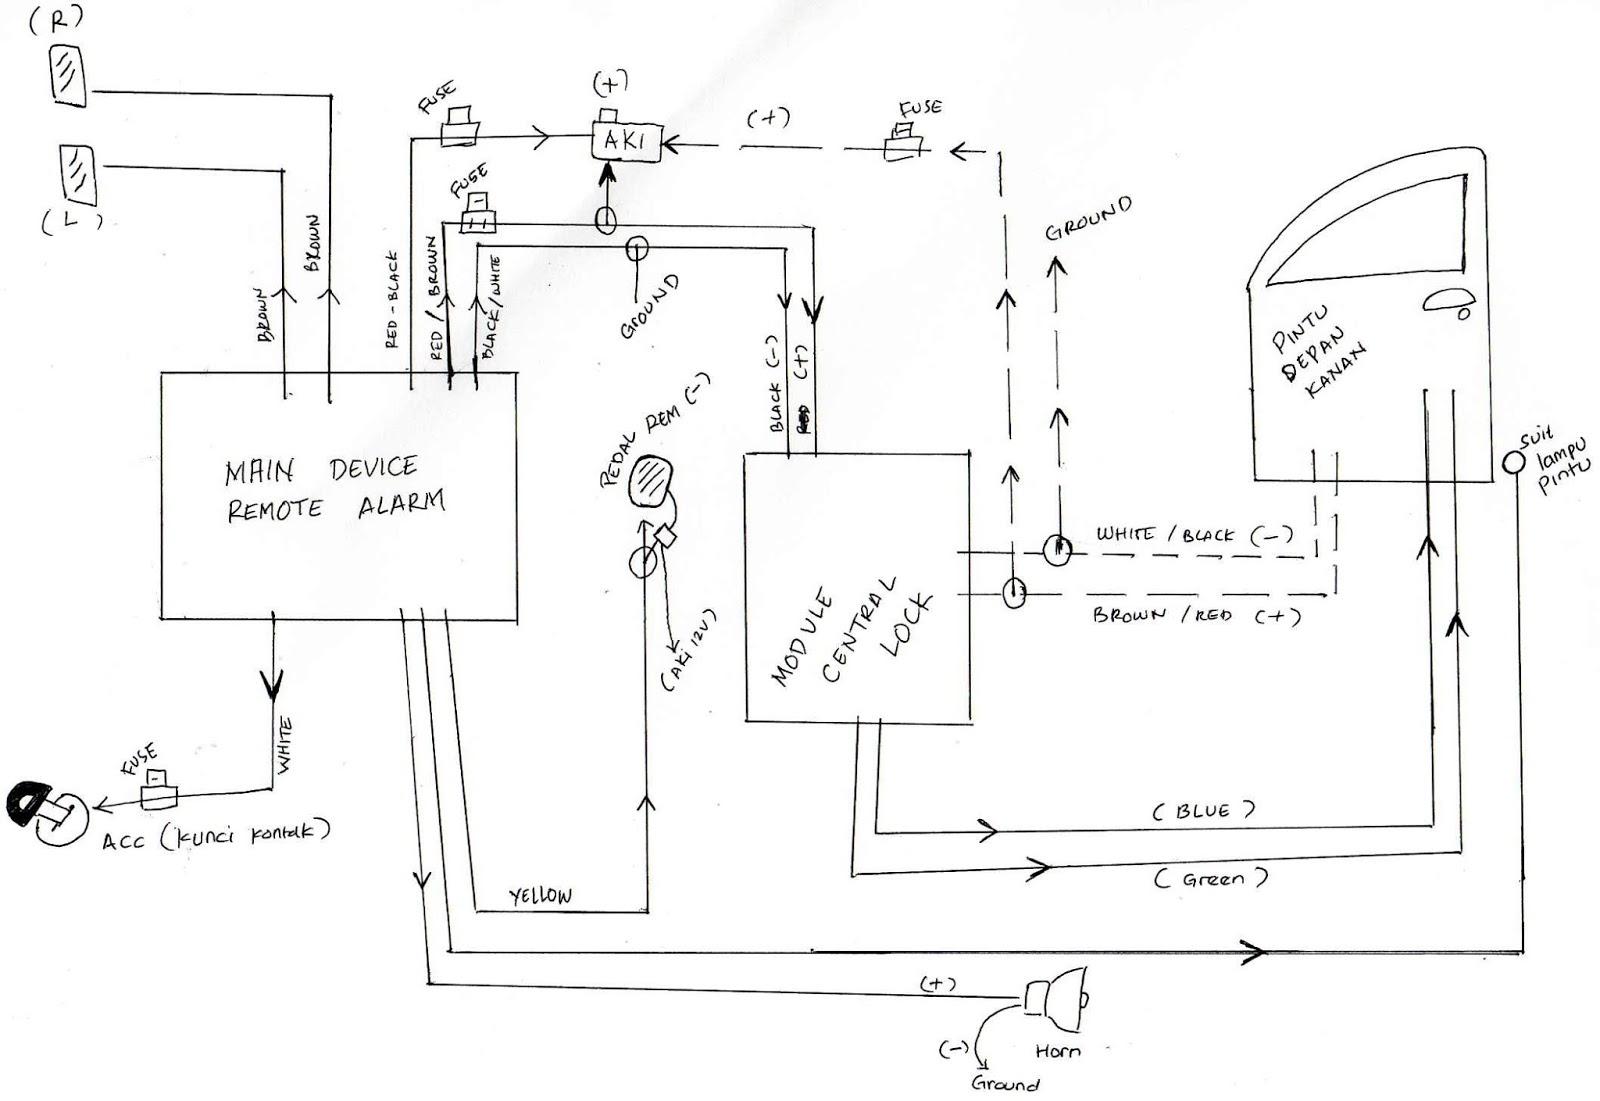 Wiring diagram ac mobil free download wiring diagram xwiaw ac plug free download wiring diagram wiring diagram central lock avanza jzgreentown of wiring diagram ac mobil asfbconference2016 Images